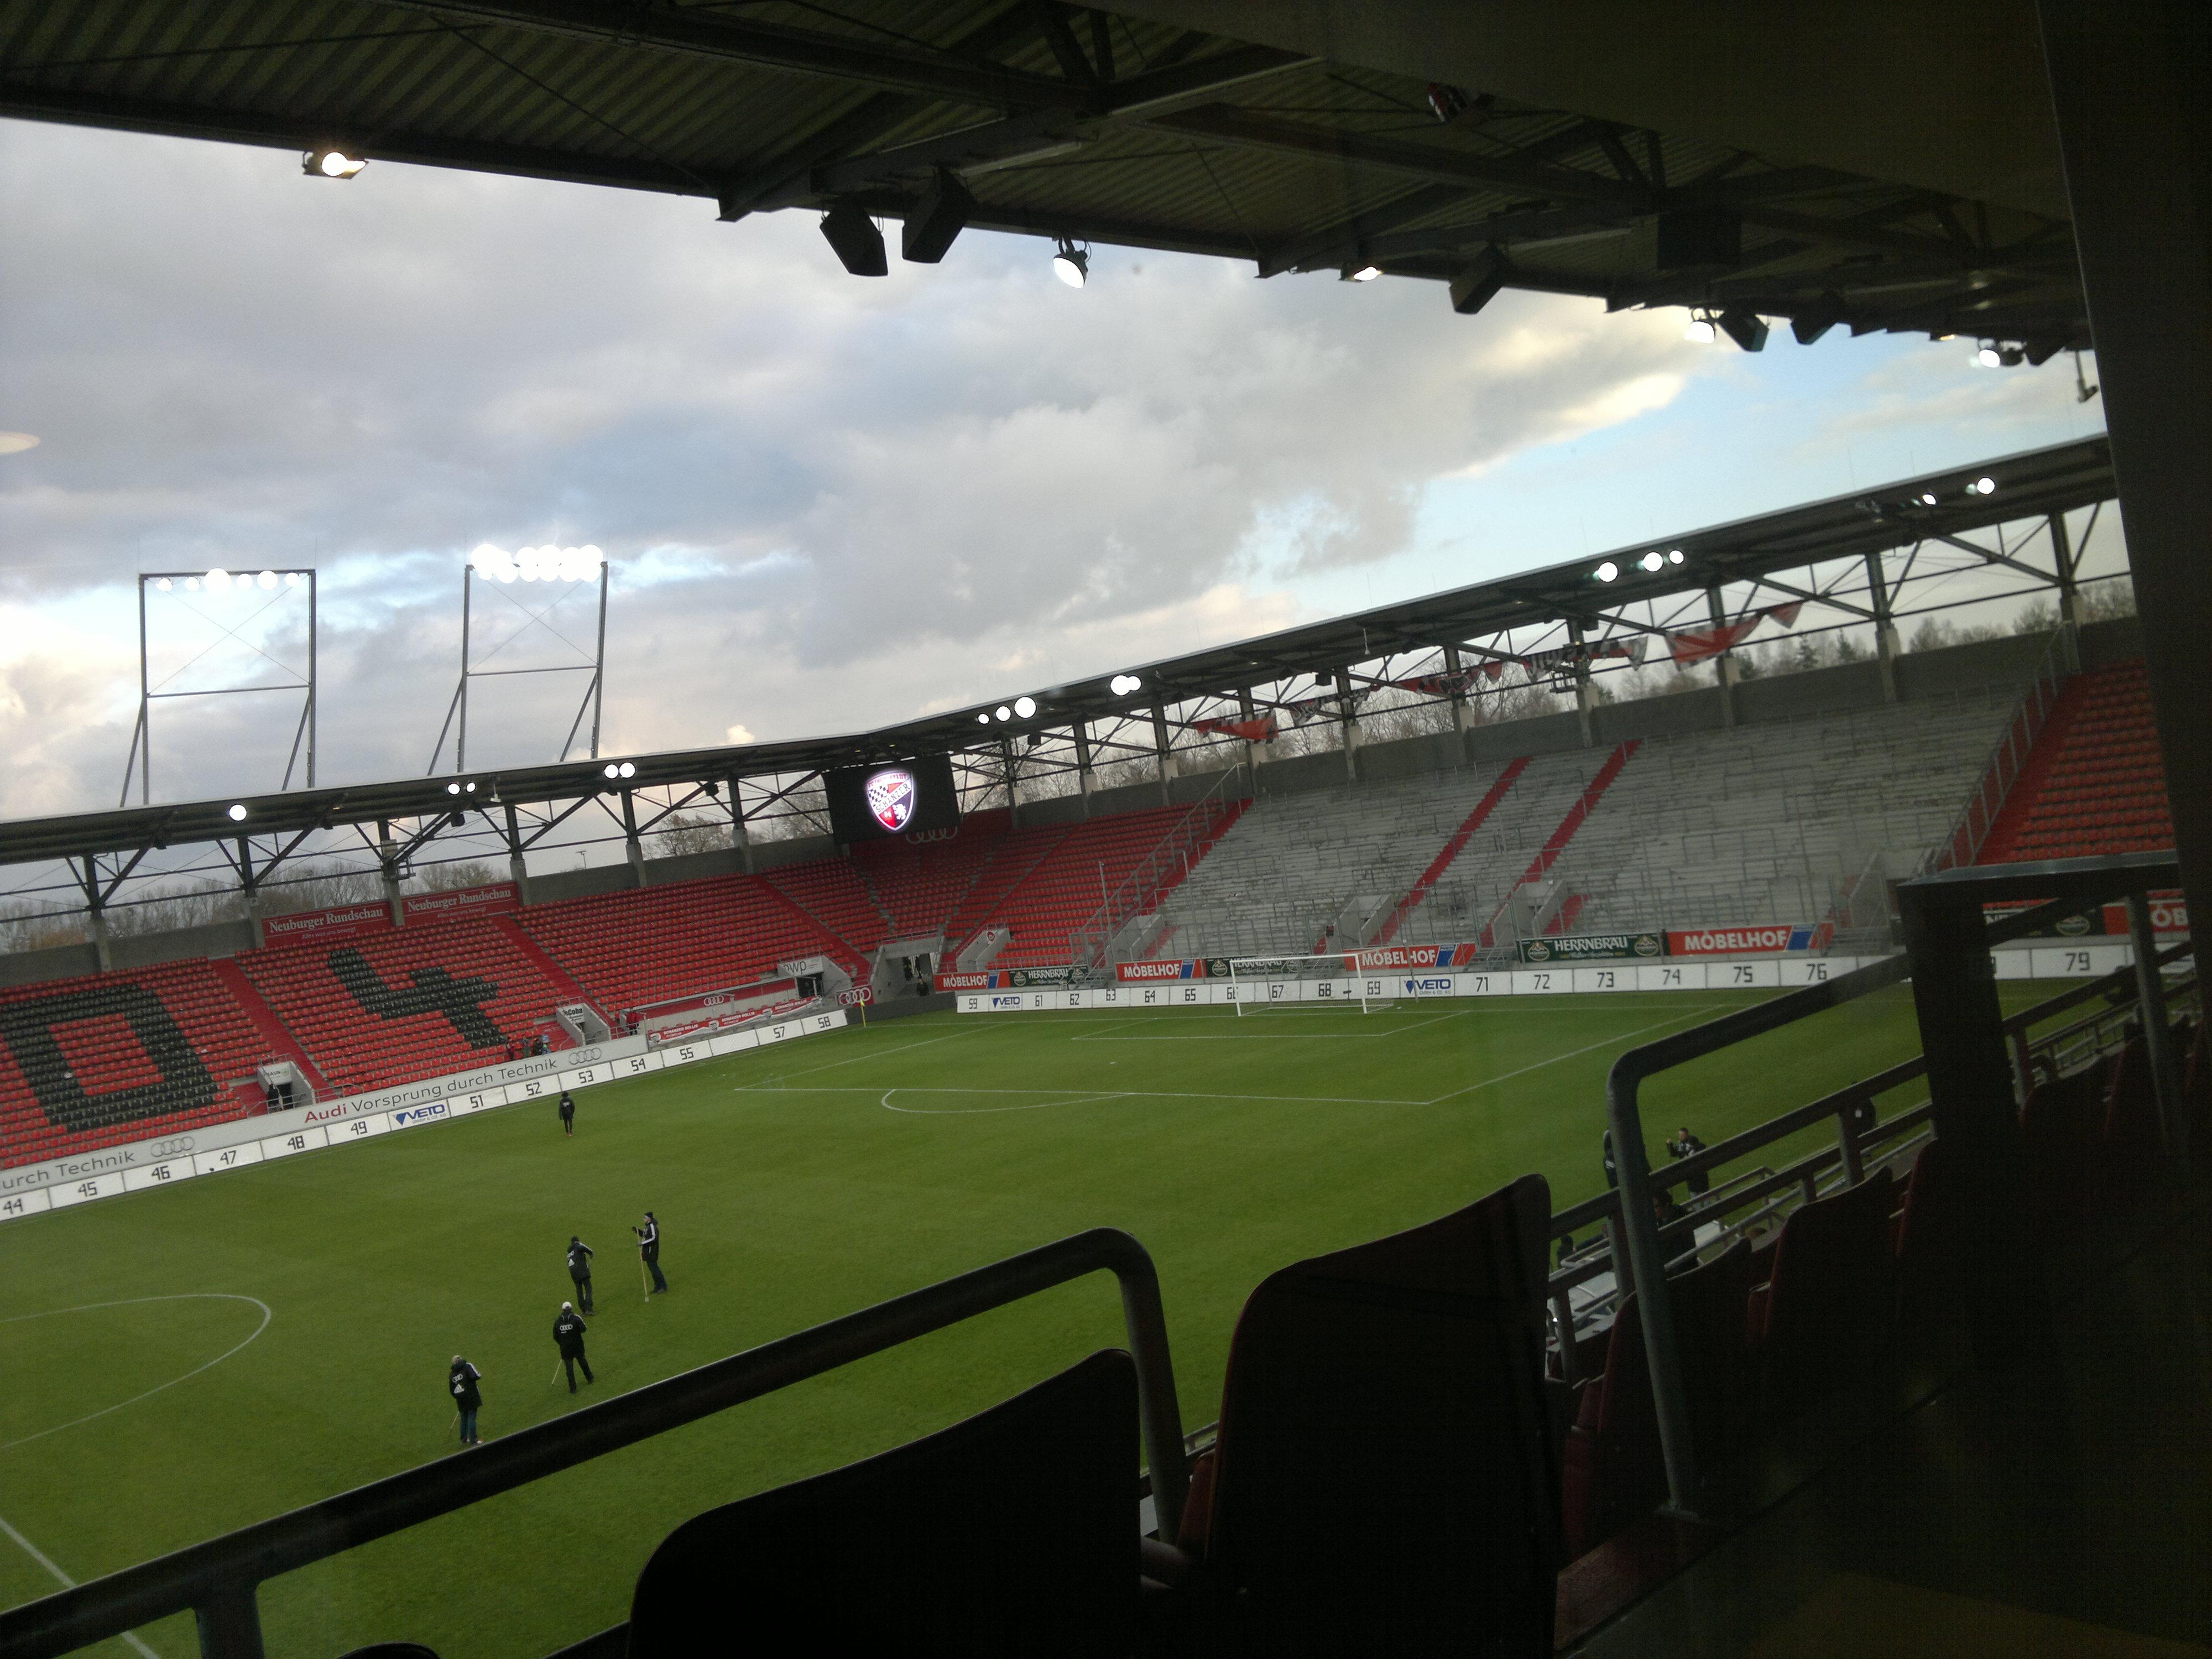 1. Fanclub FC Ingolstadt 04